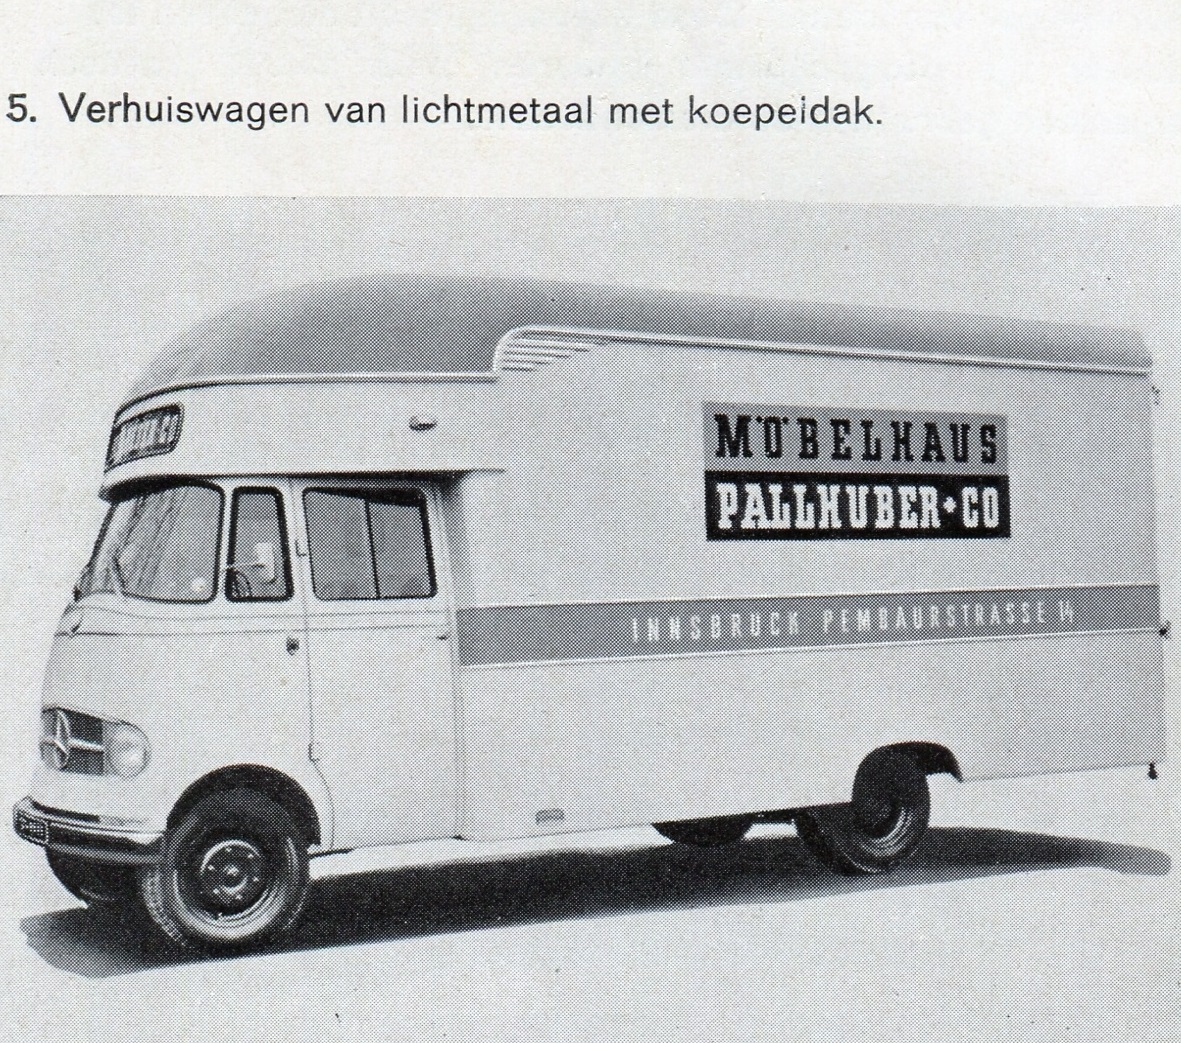 MB-l-405-407-20